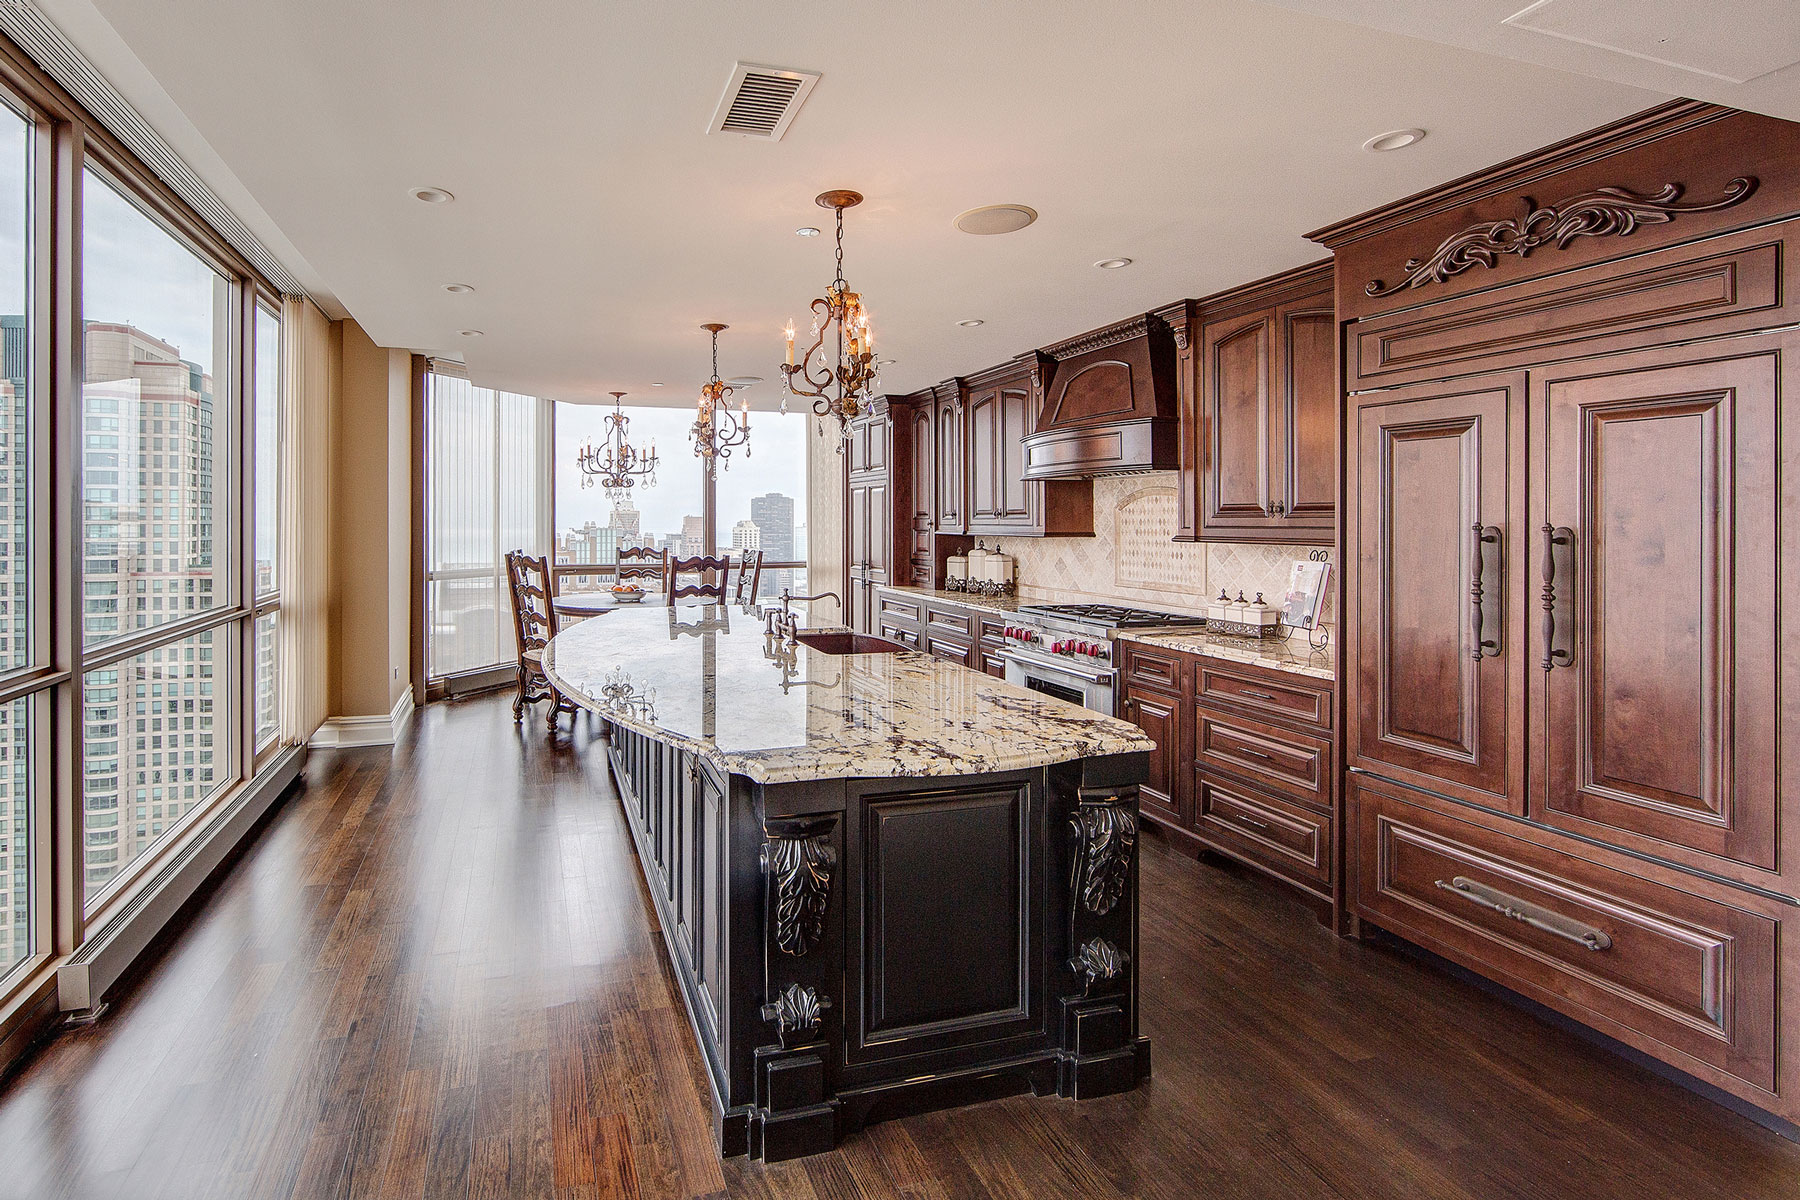 Chicago Condo Kitchen Remodel